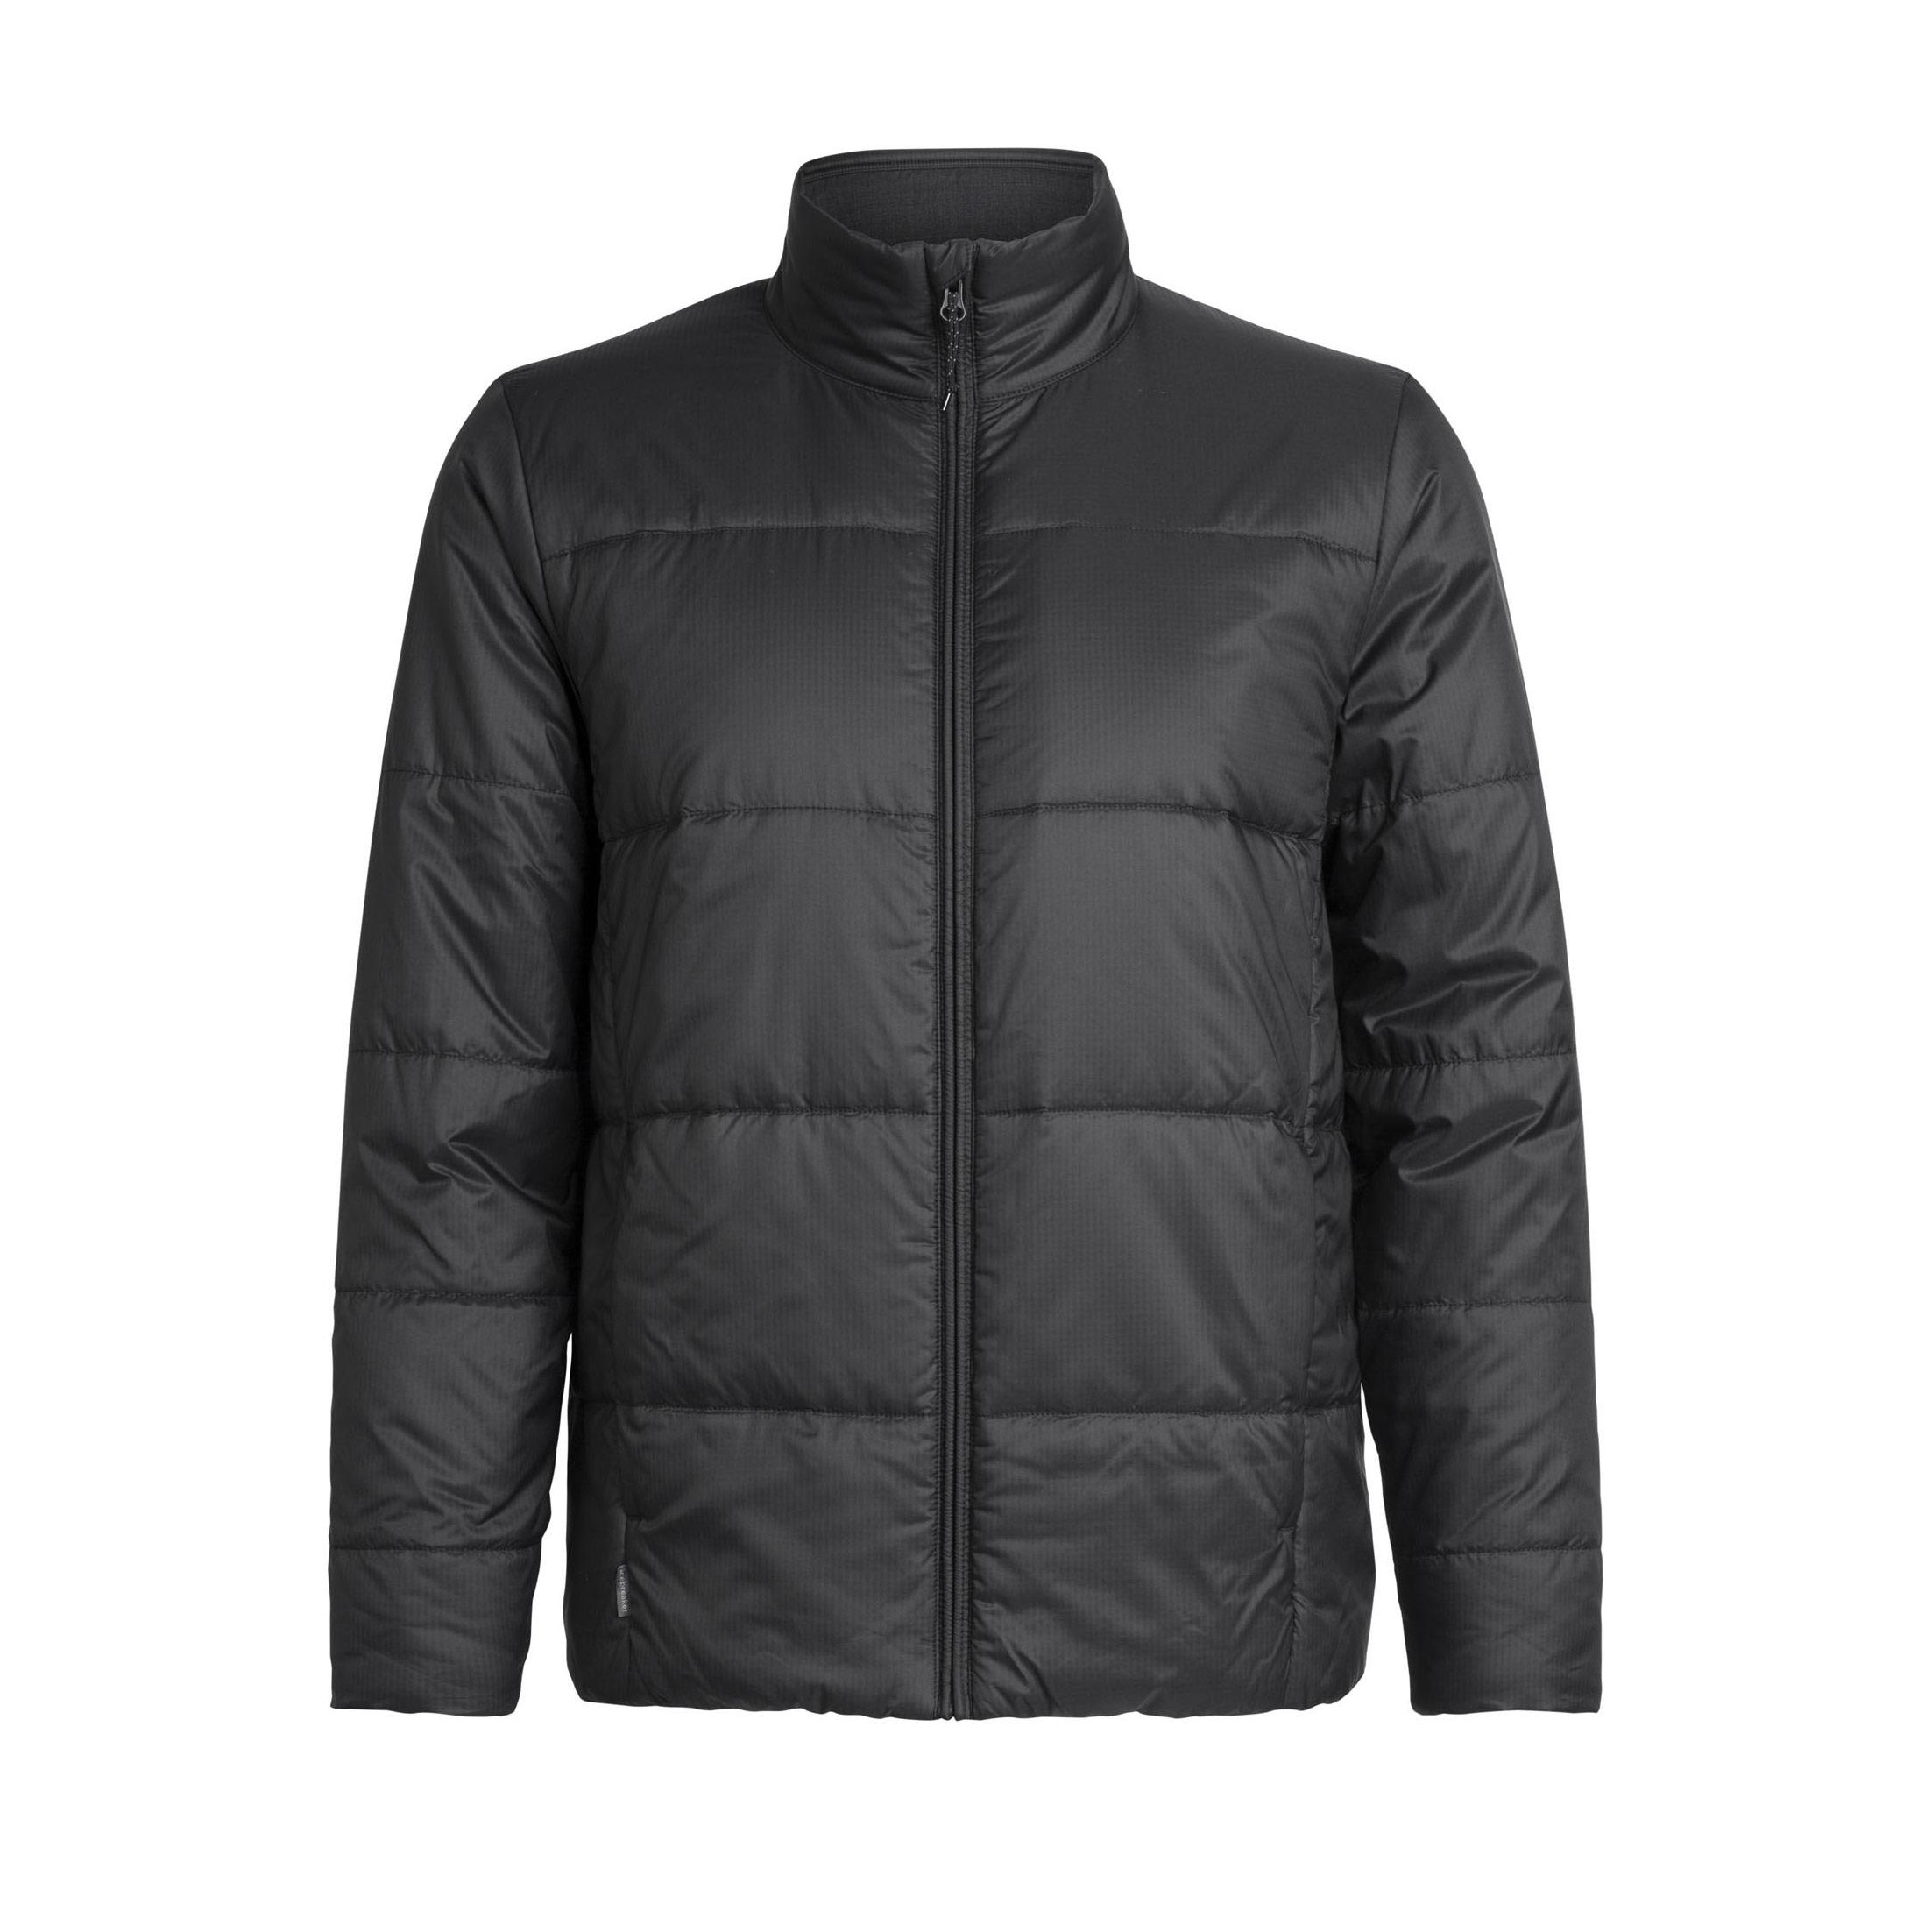 Collingwood Jacket - Men's